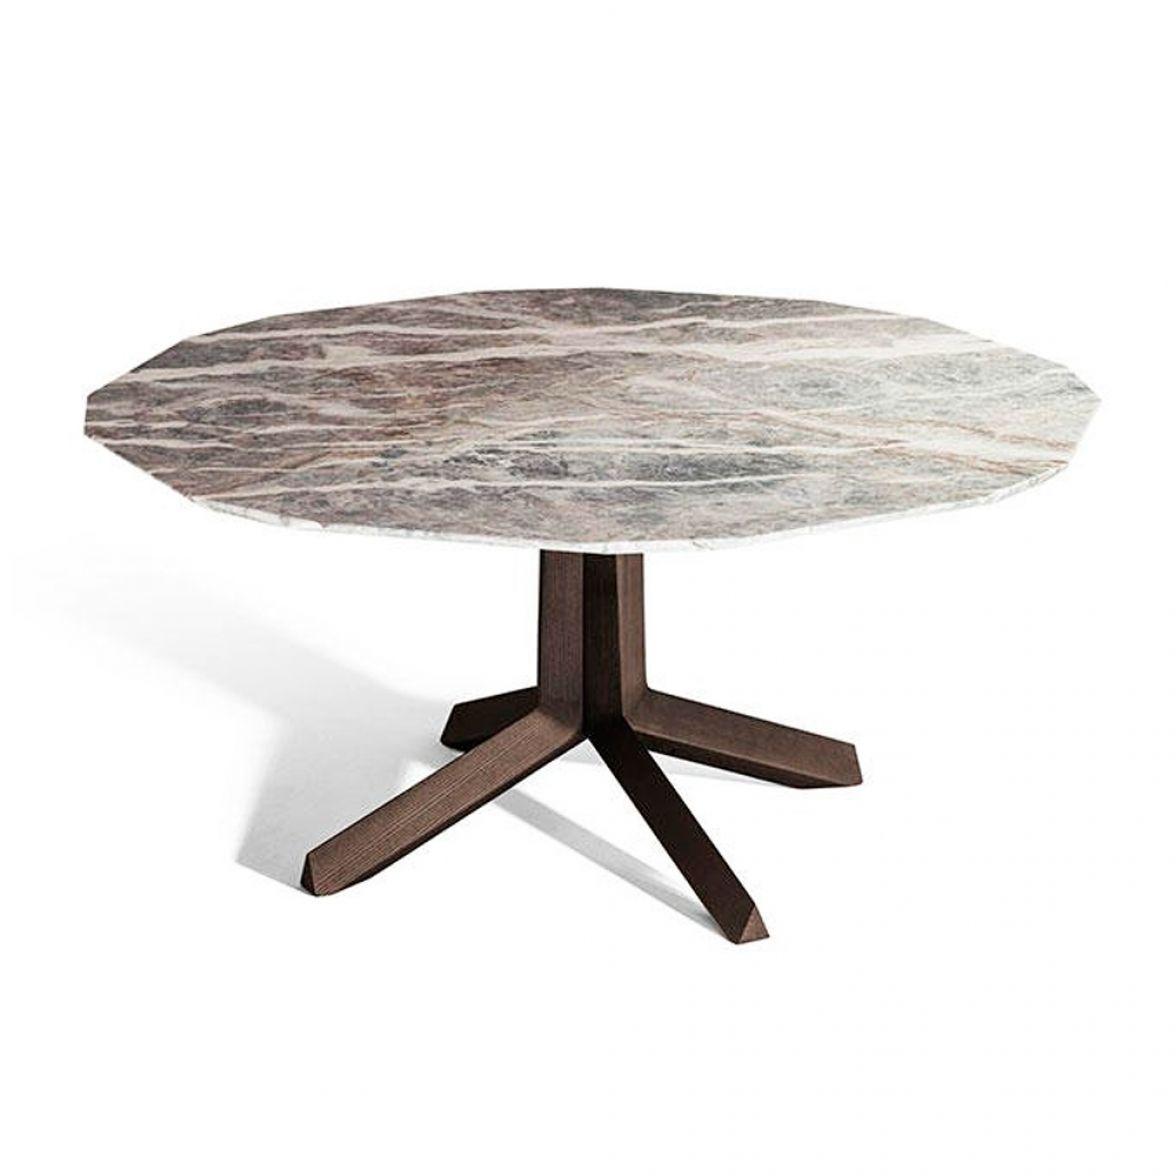 Othello table